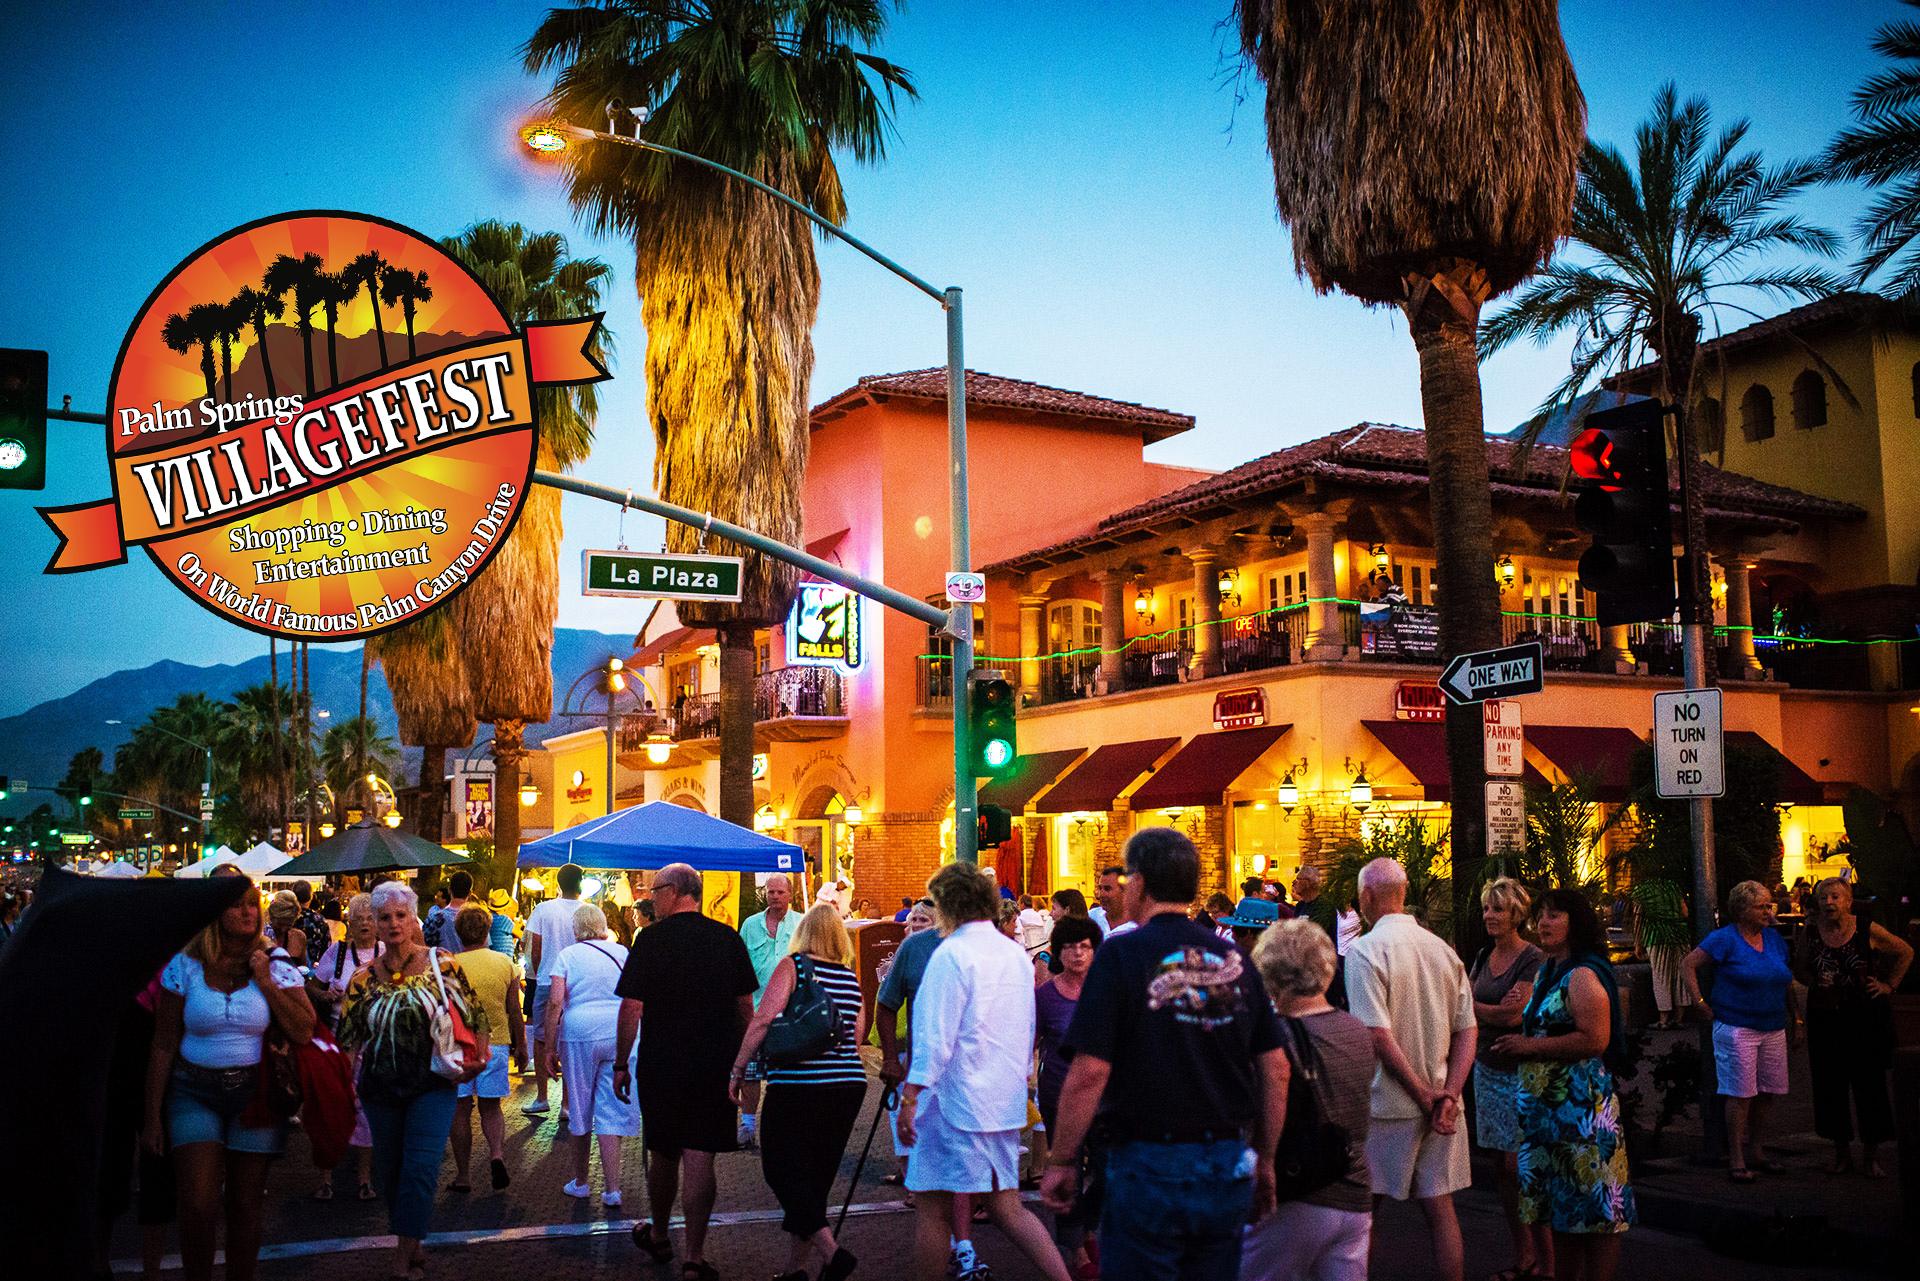 Villagefest Palm Springs, CA • Every Thursday Night